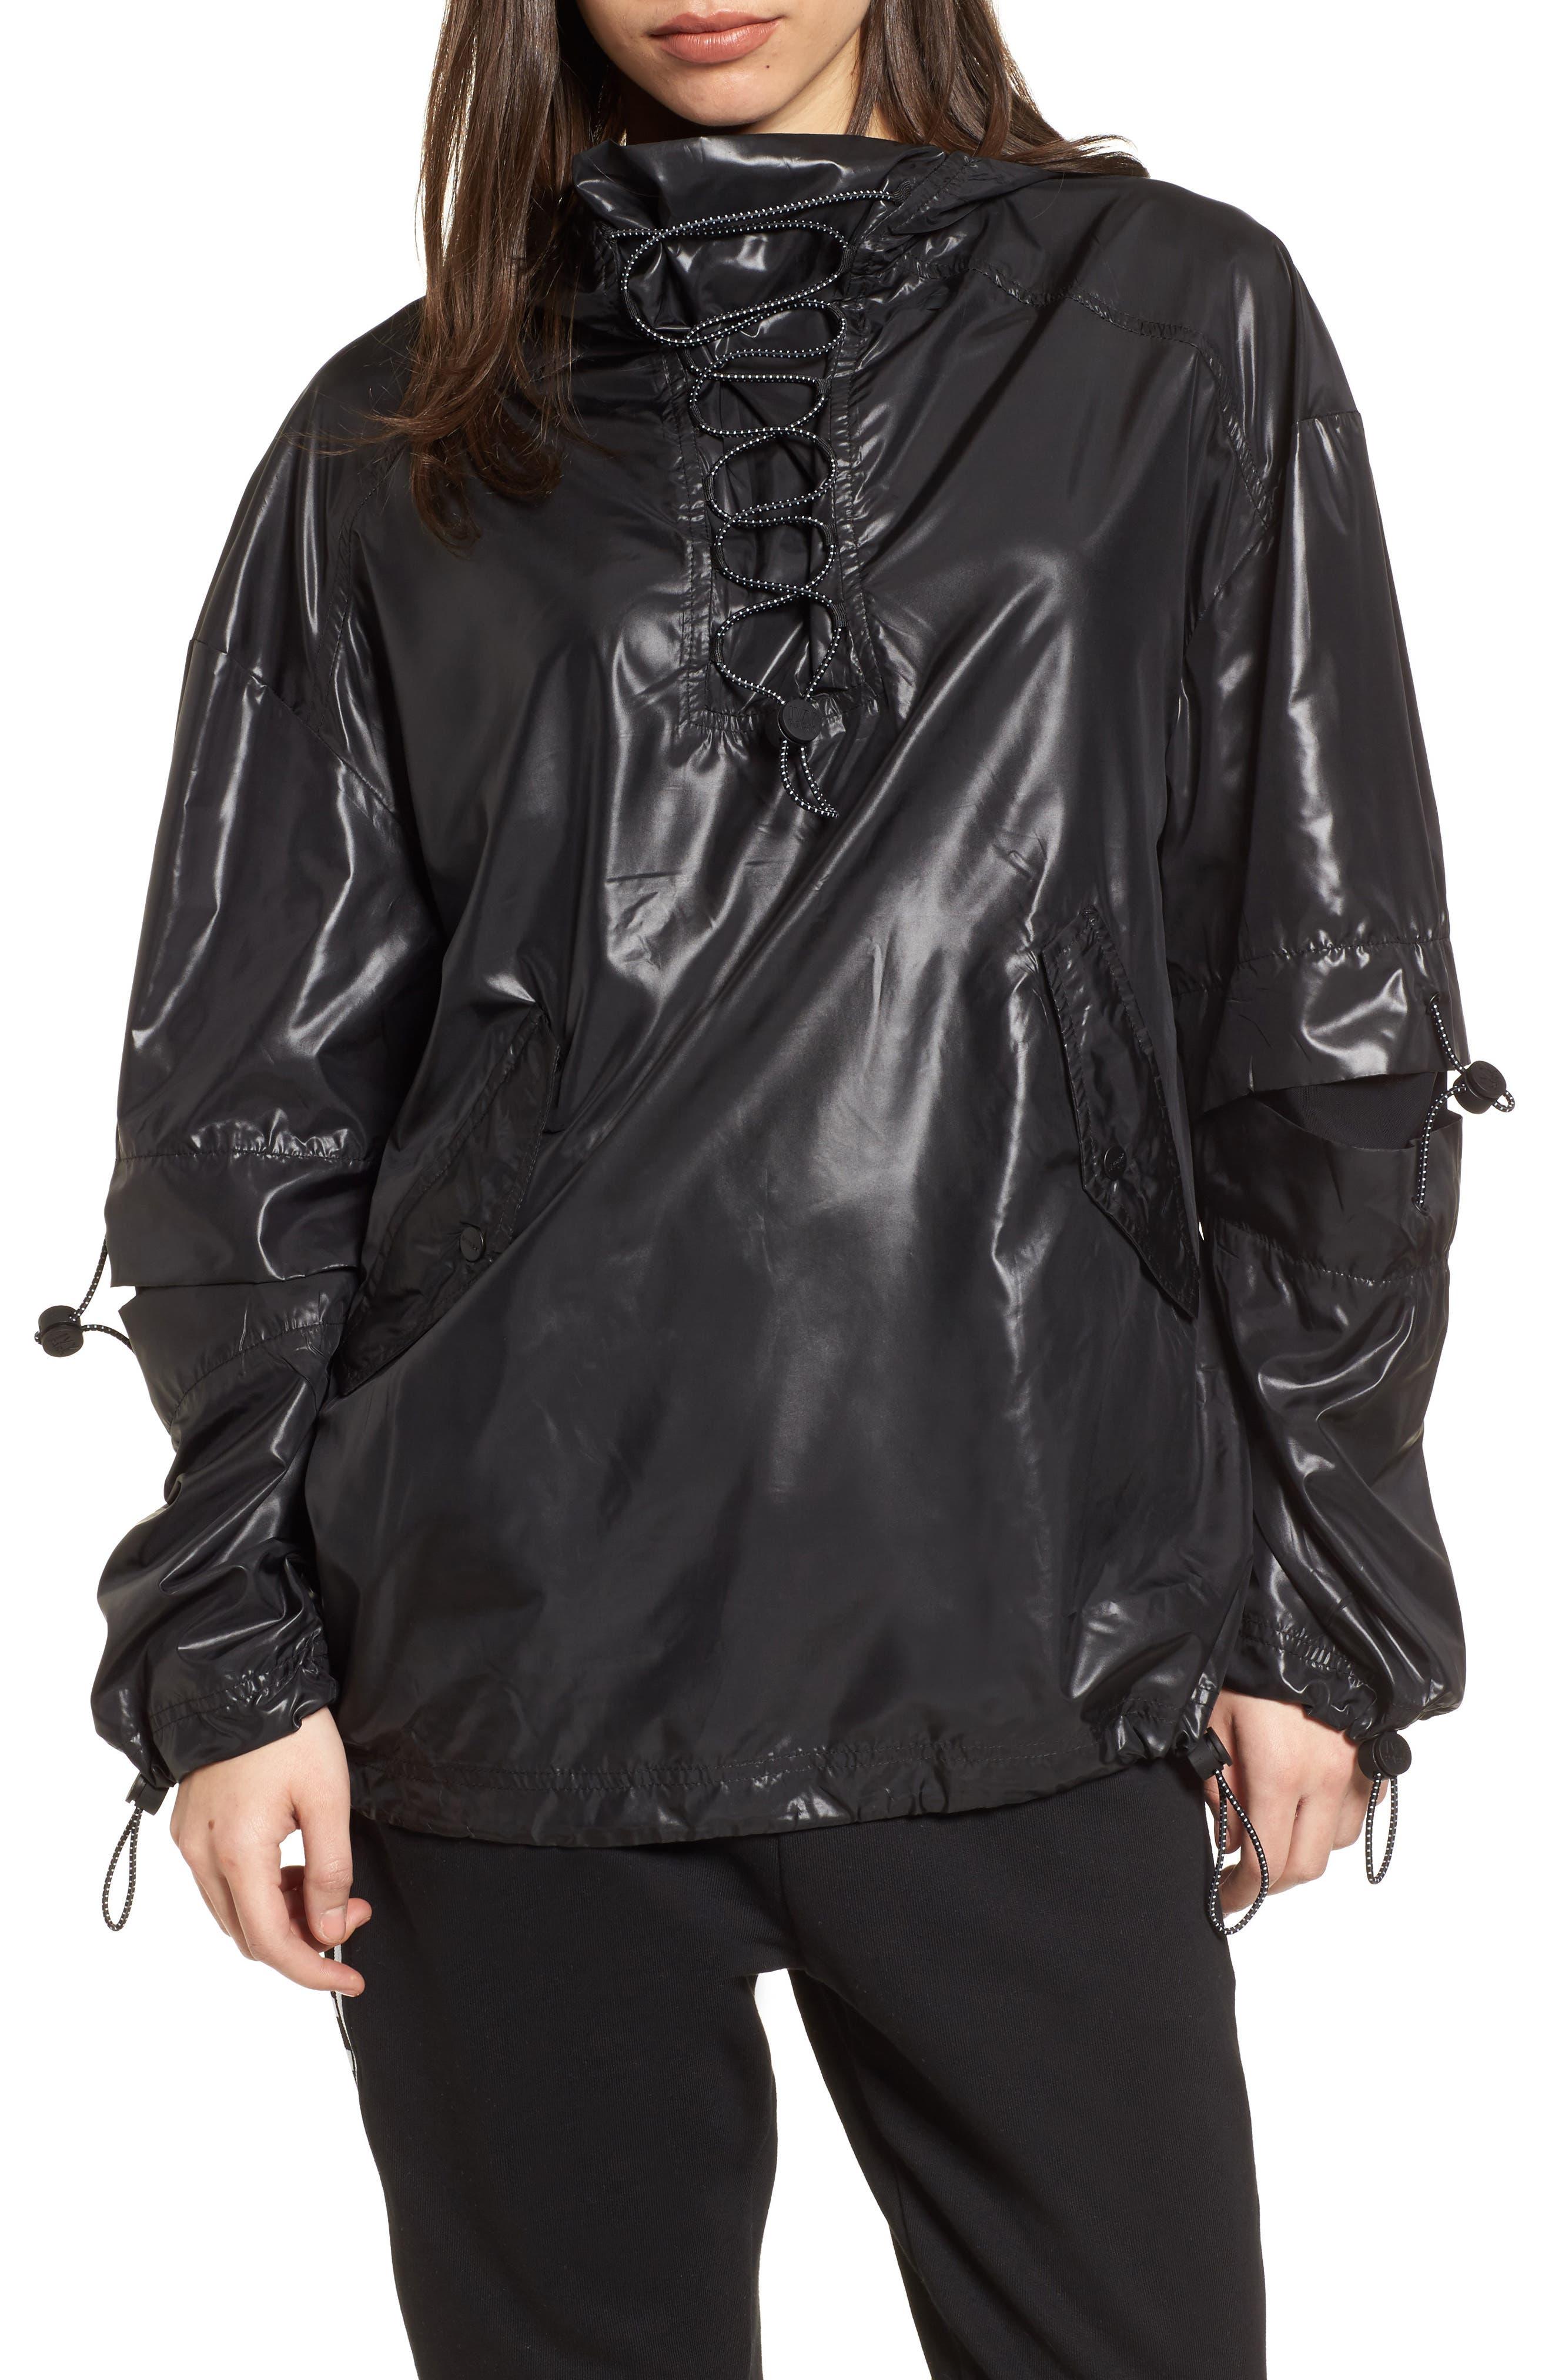 Alternate Image 1 Selected - IVY PARK® Hi Shine Lace-Up Jacket